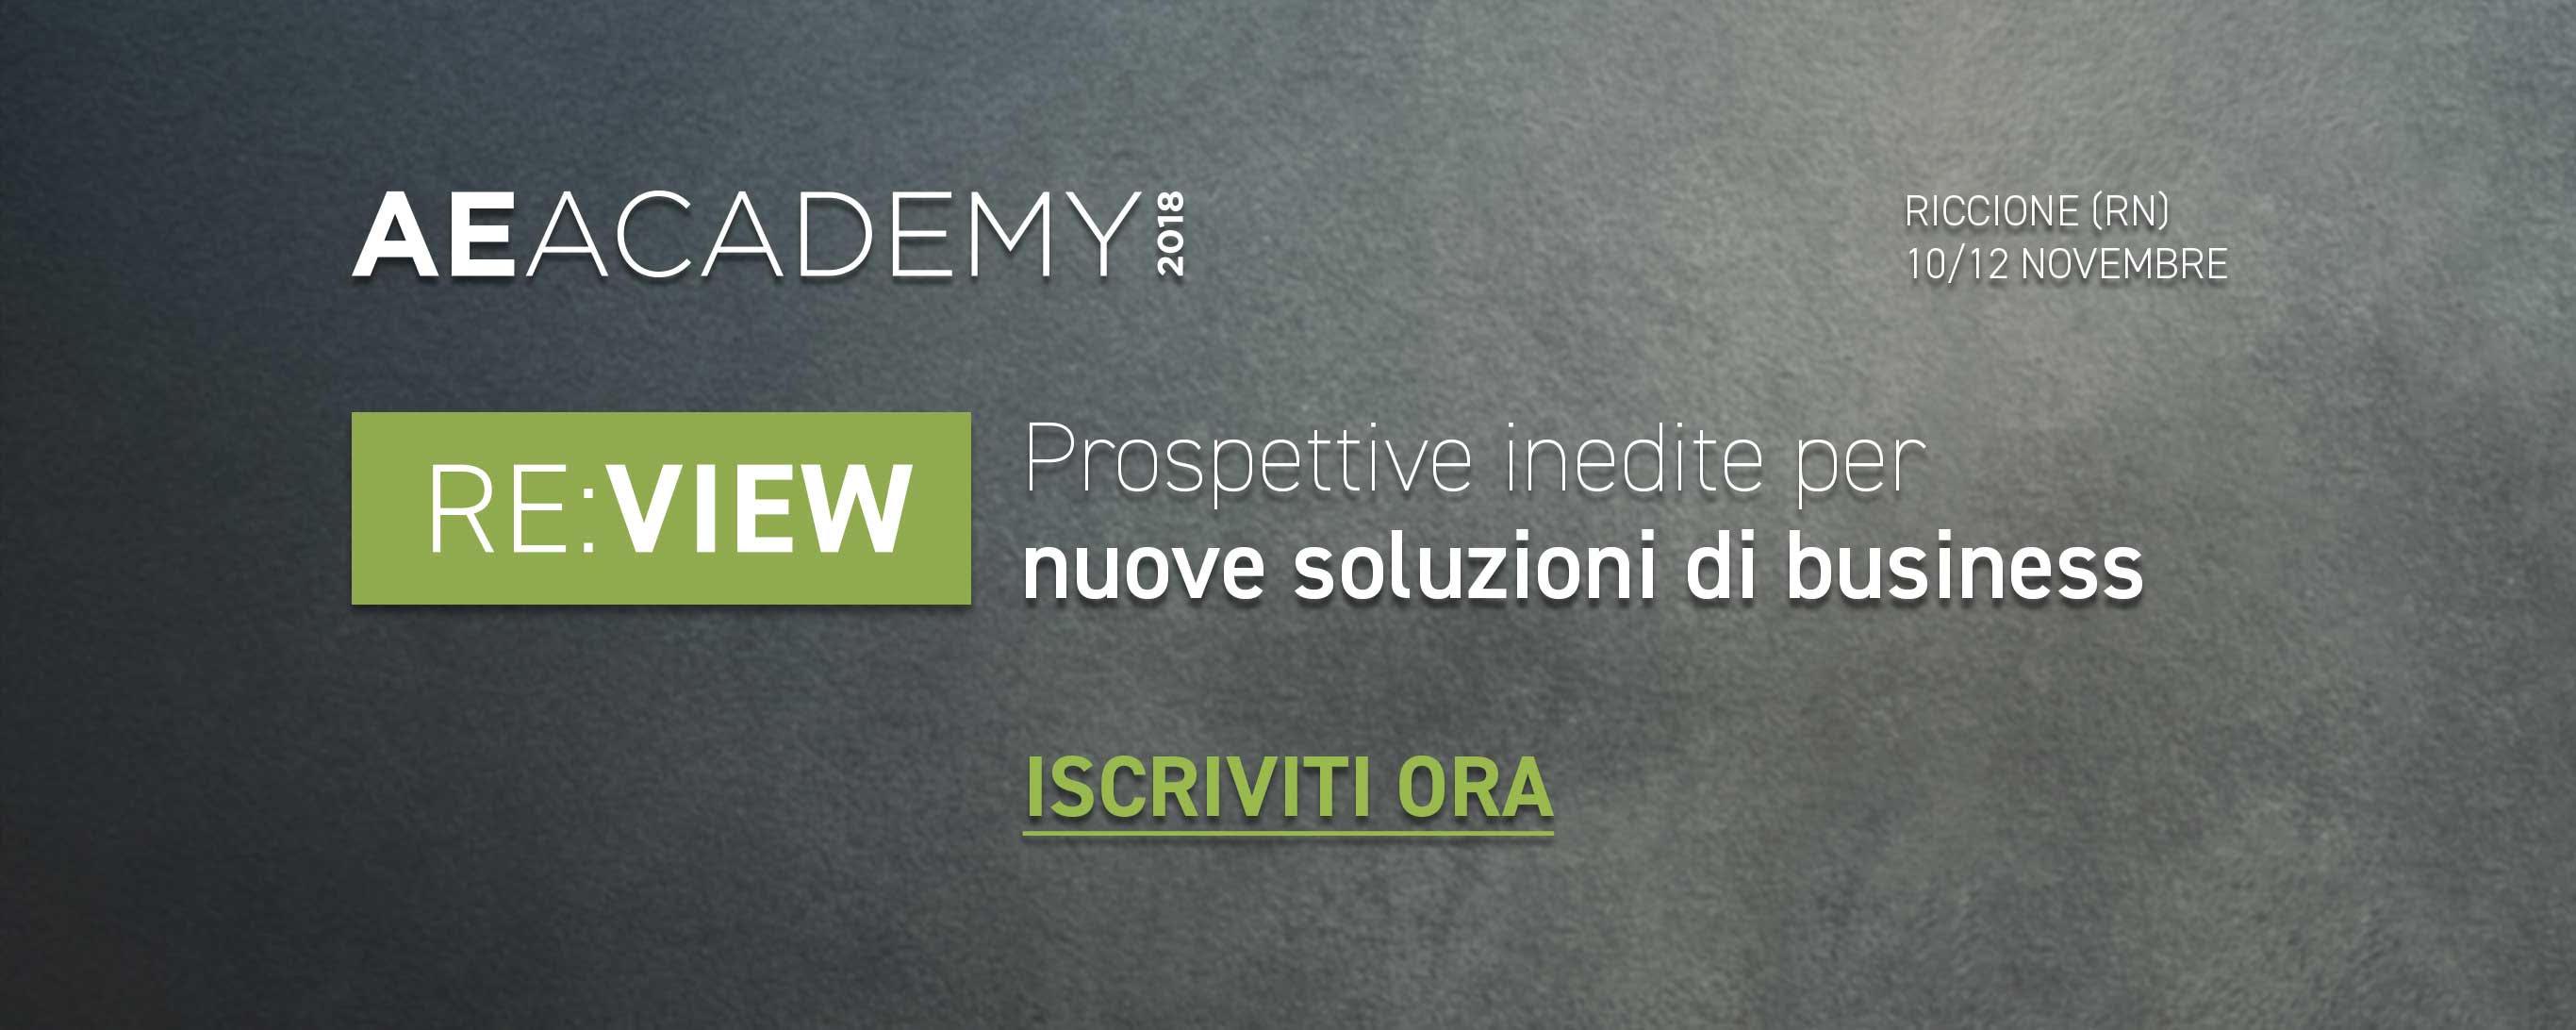 banner academy